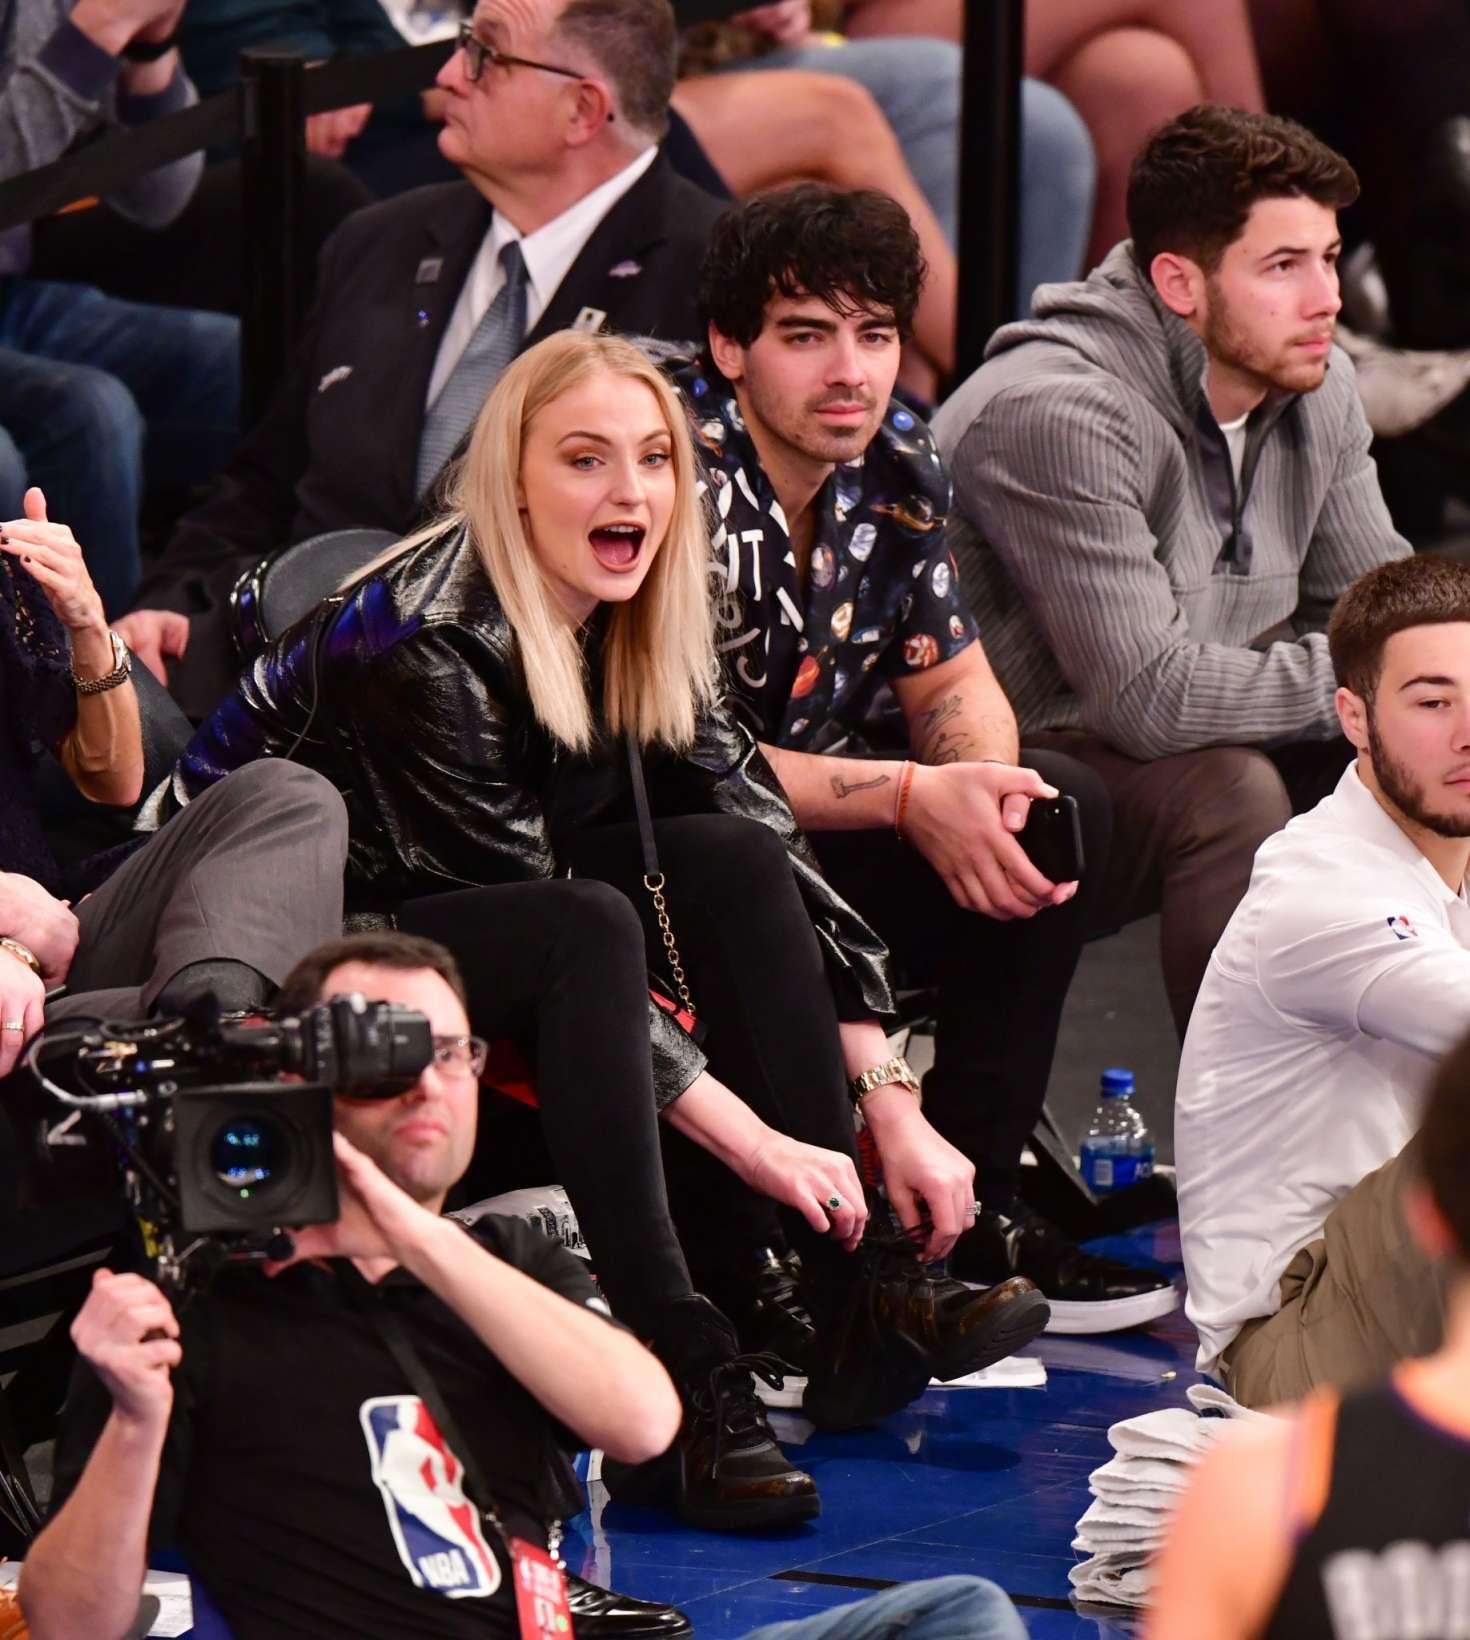 Sophie Turner, Joe and Nick Jonas - Phoenix Suns v New York Knicks Game in New York City